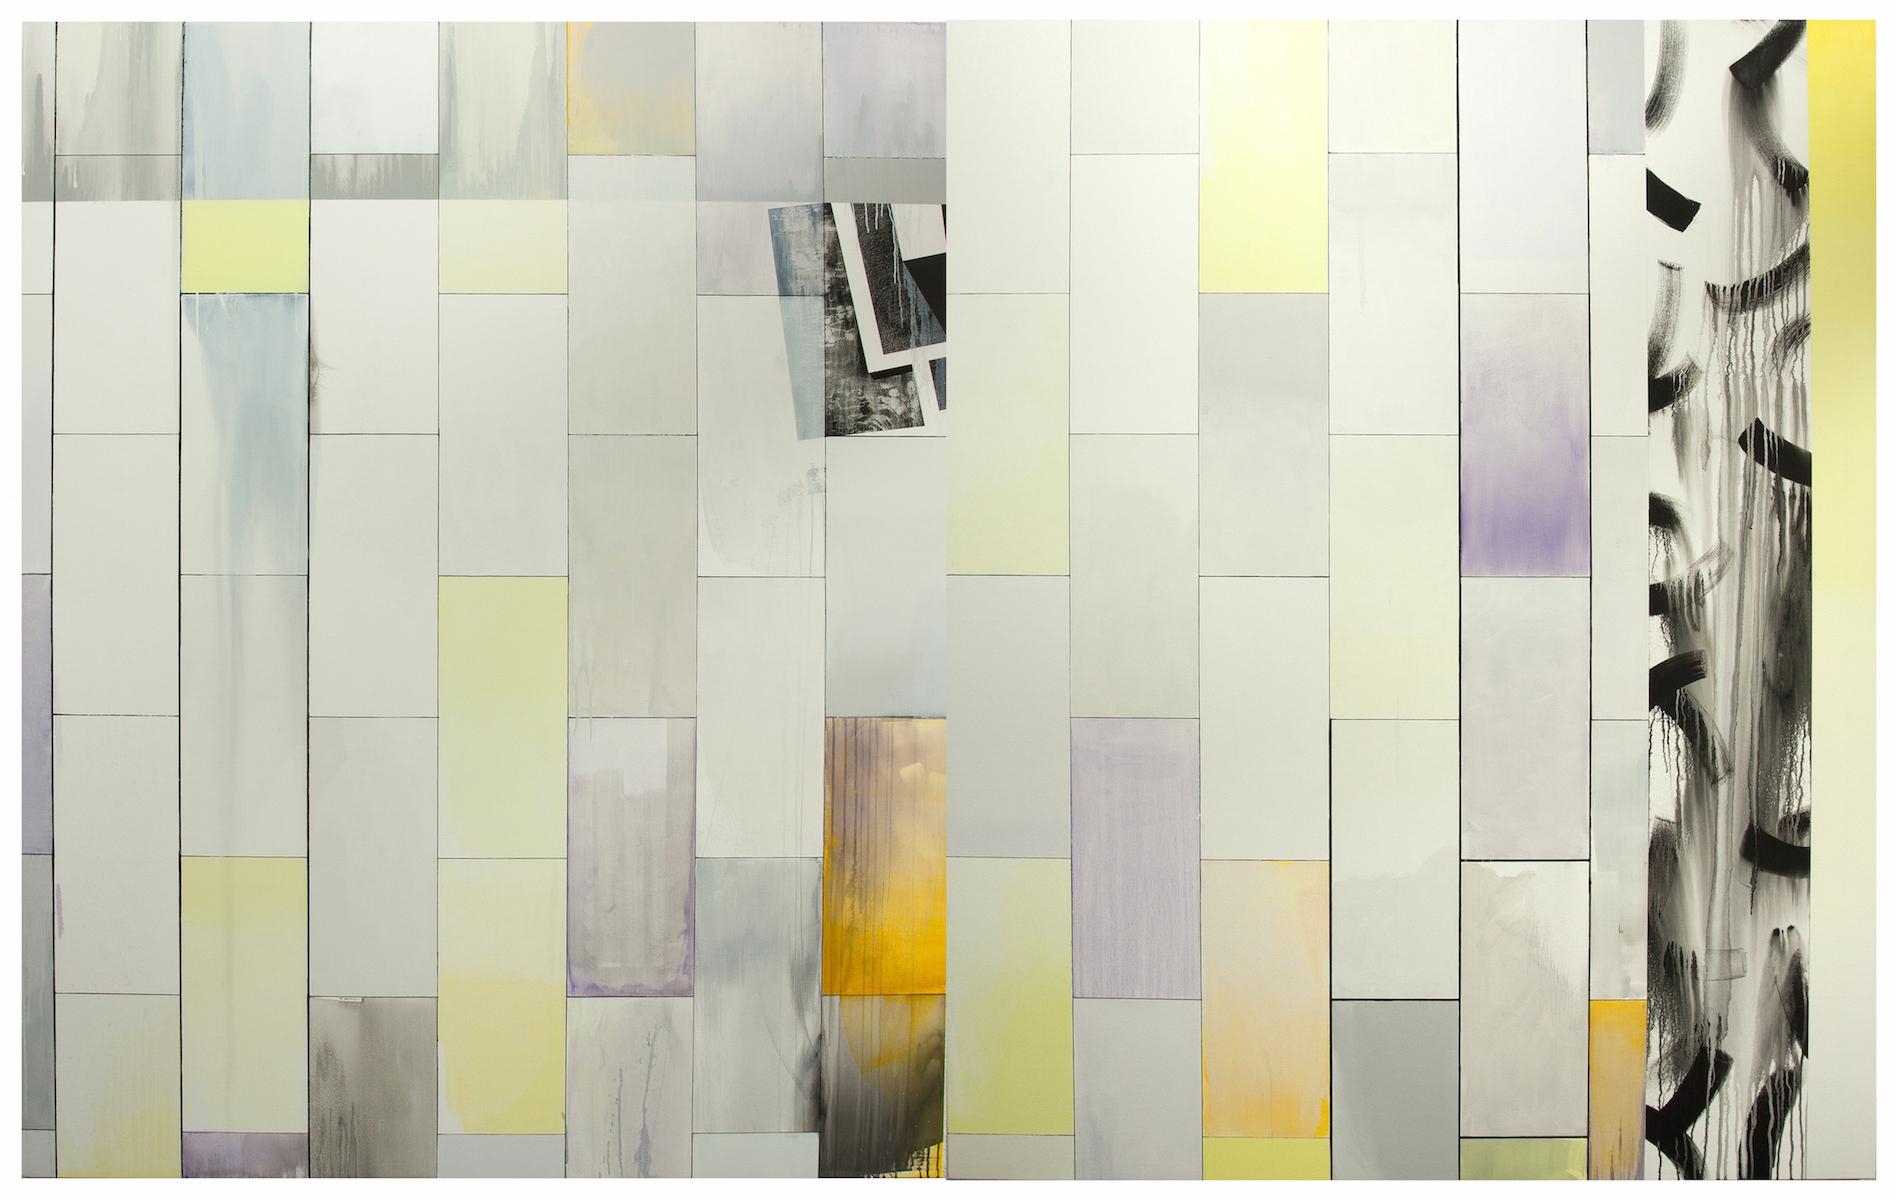 Wall of windows (divider), 2016